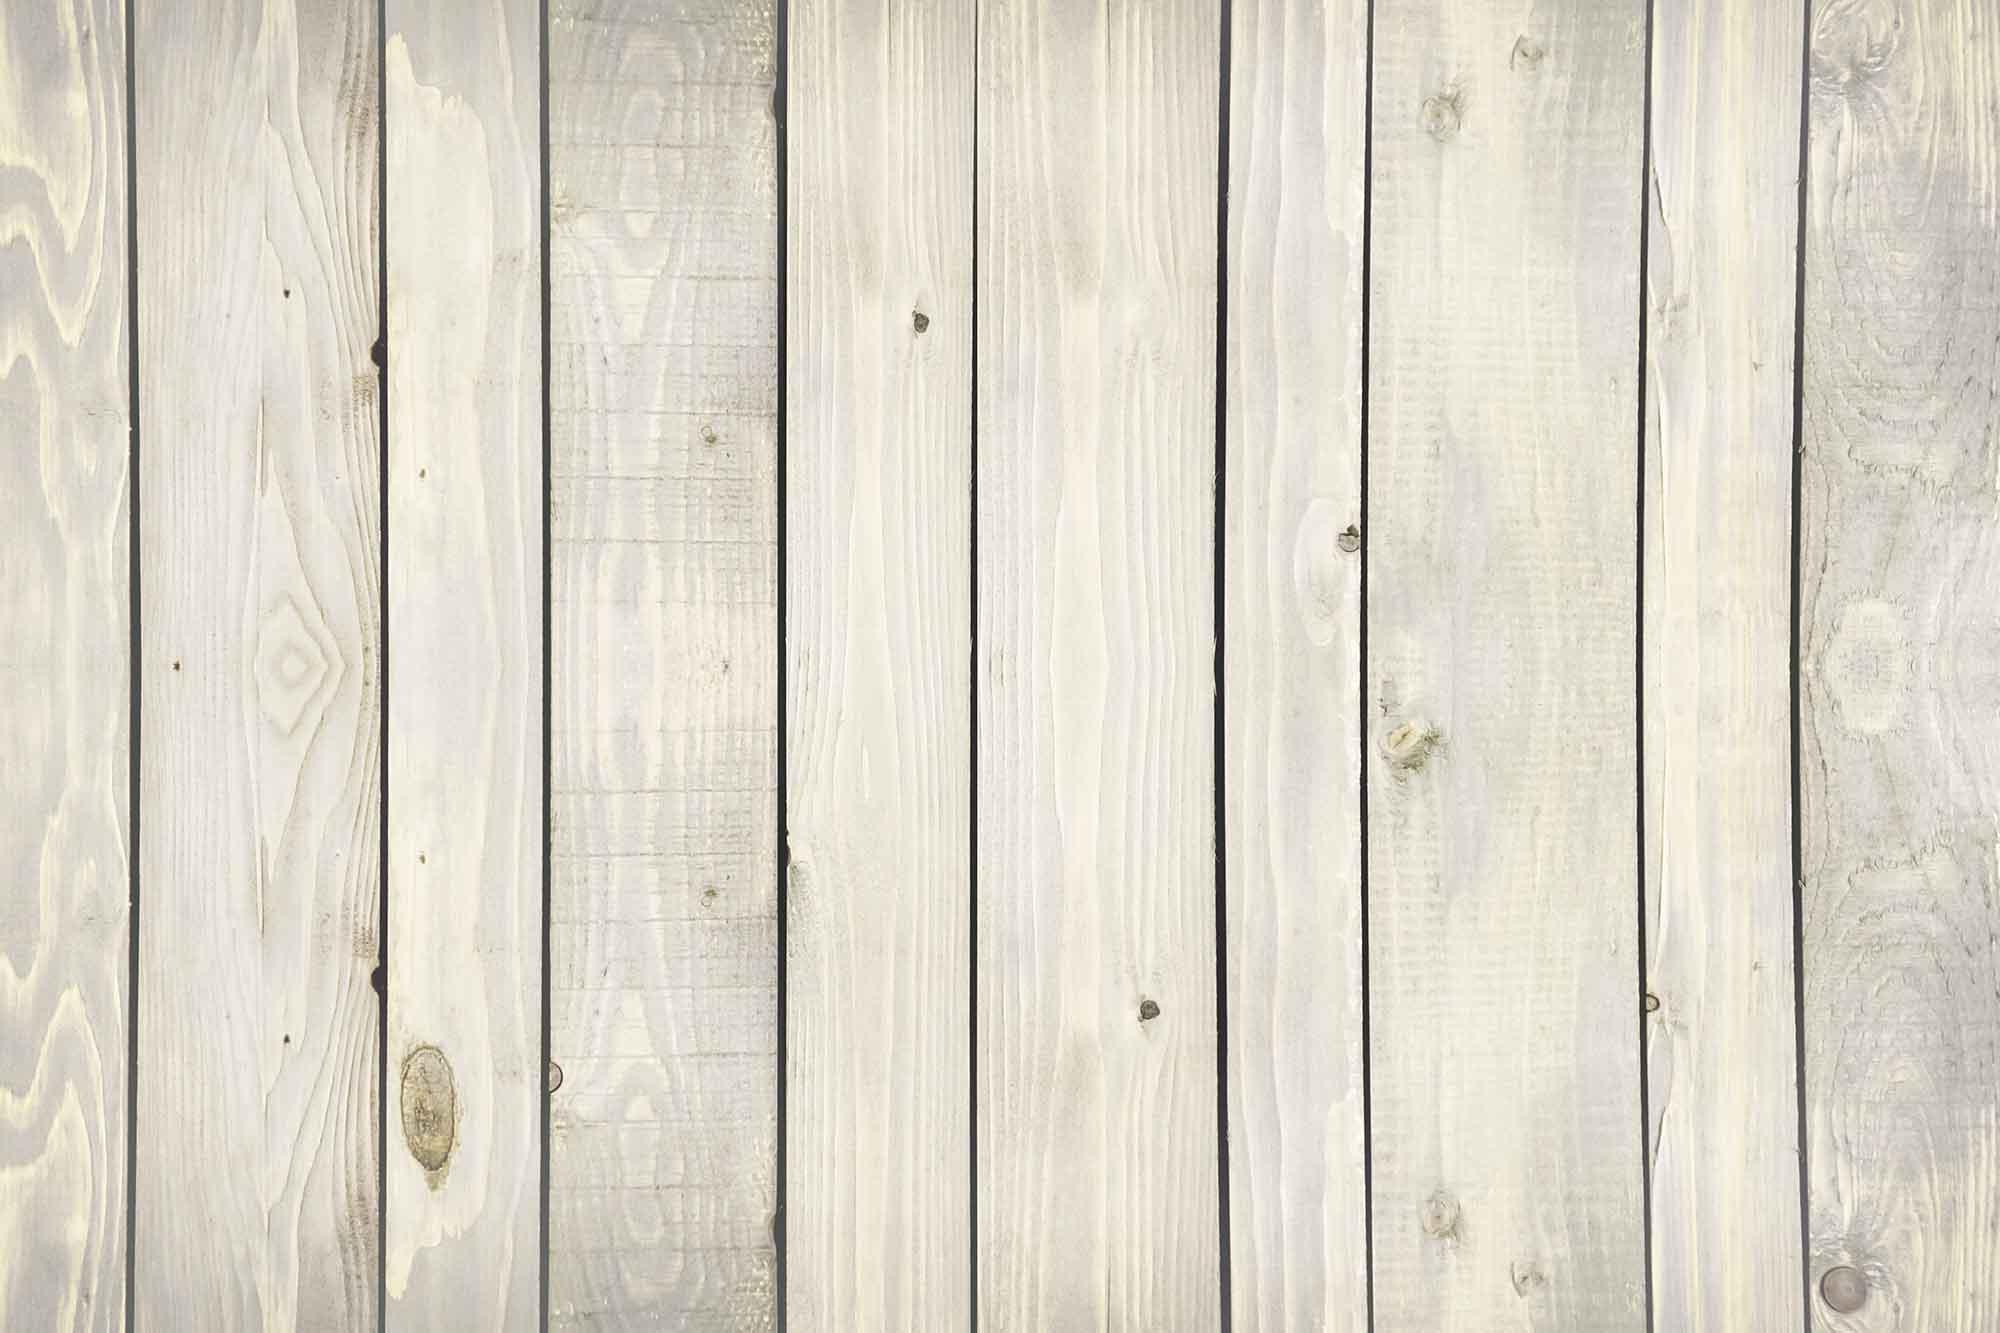 Light Wood Background Texture 2